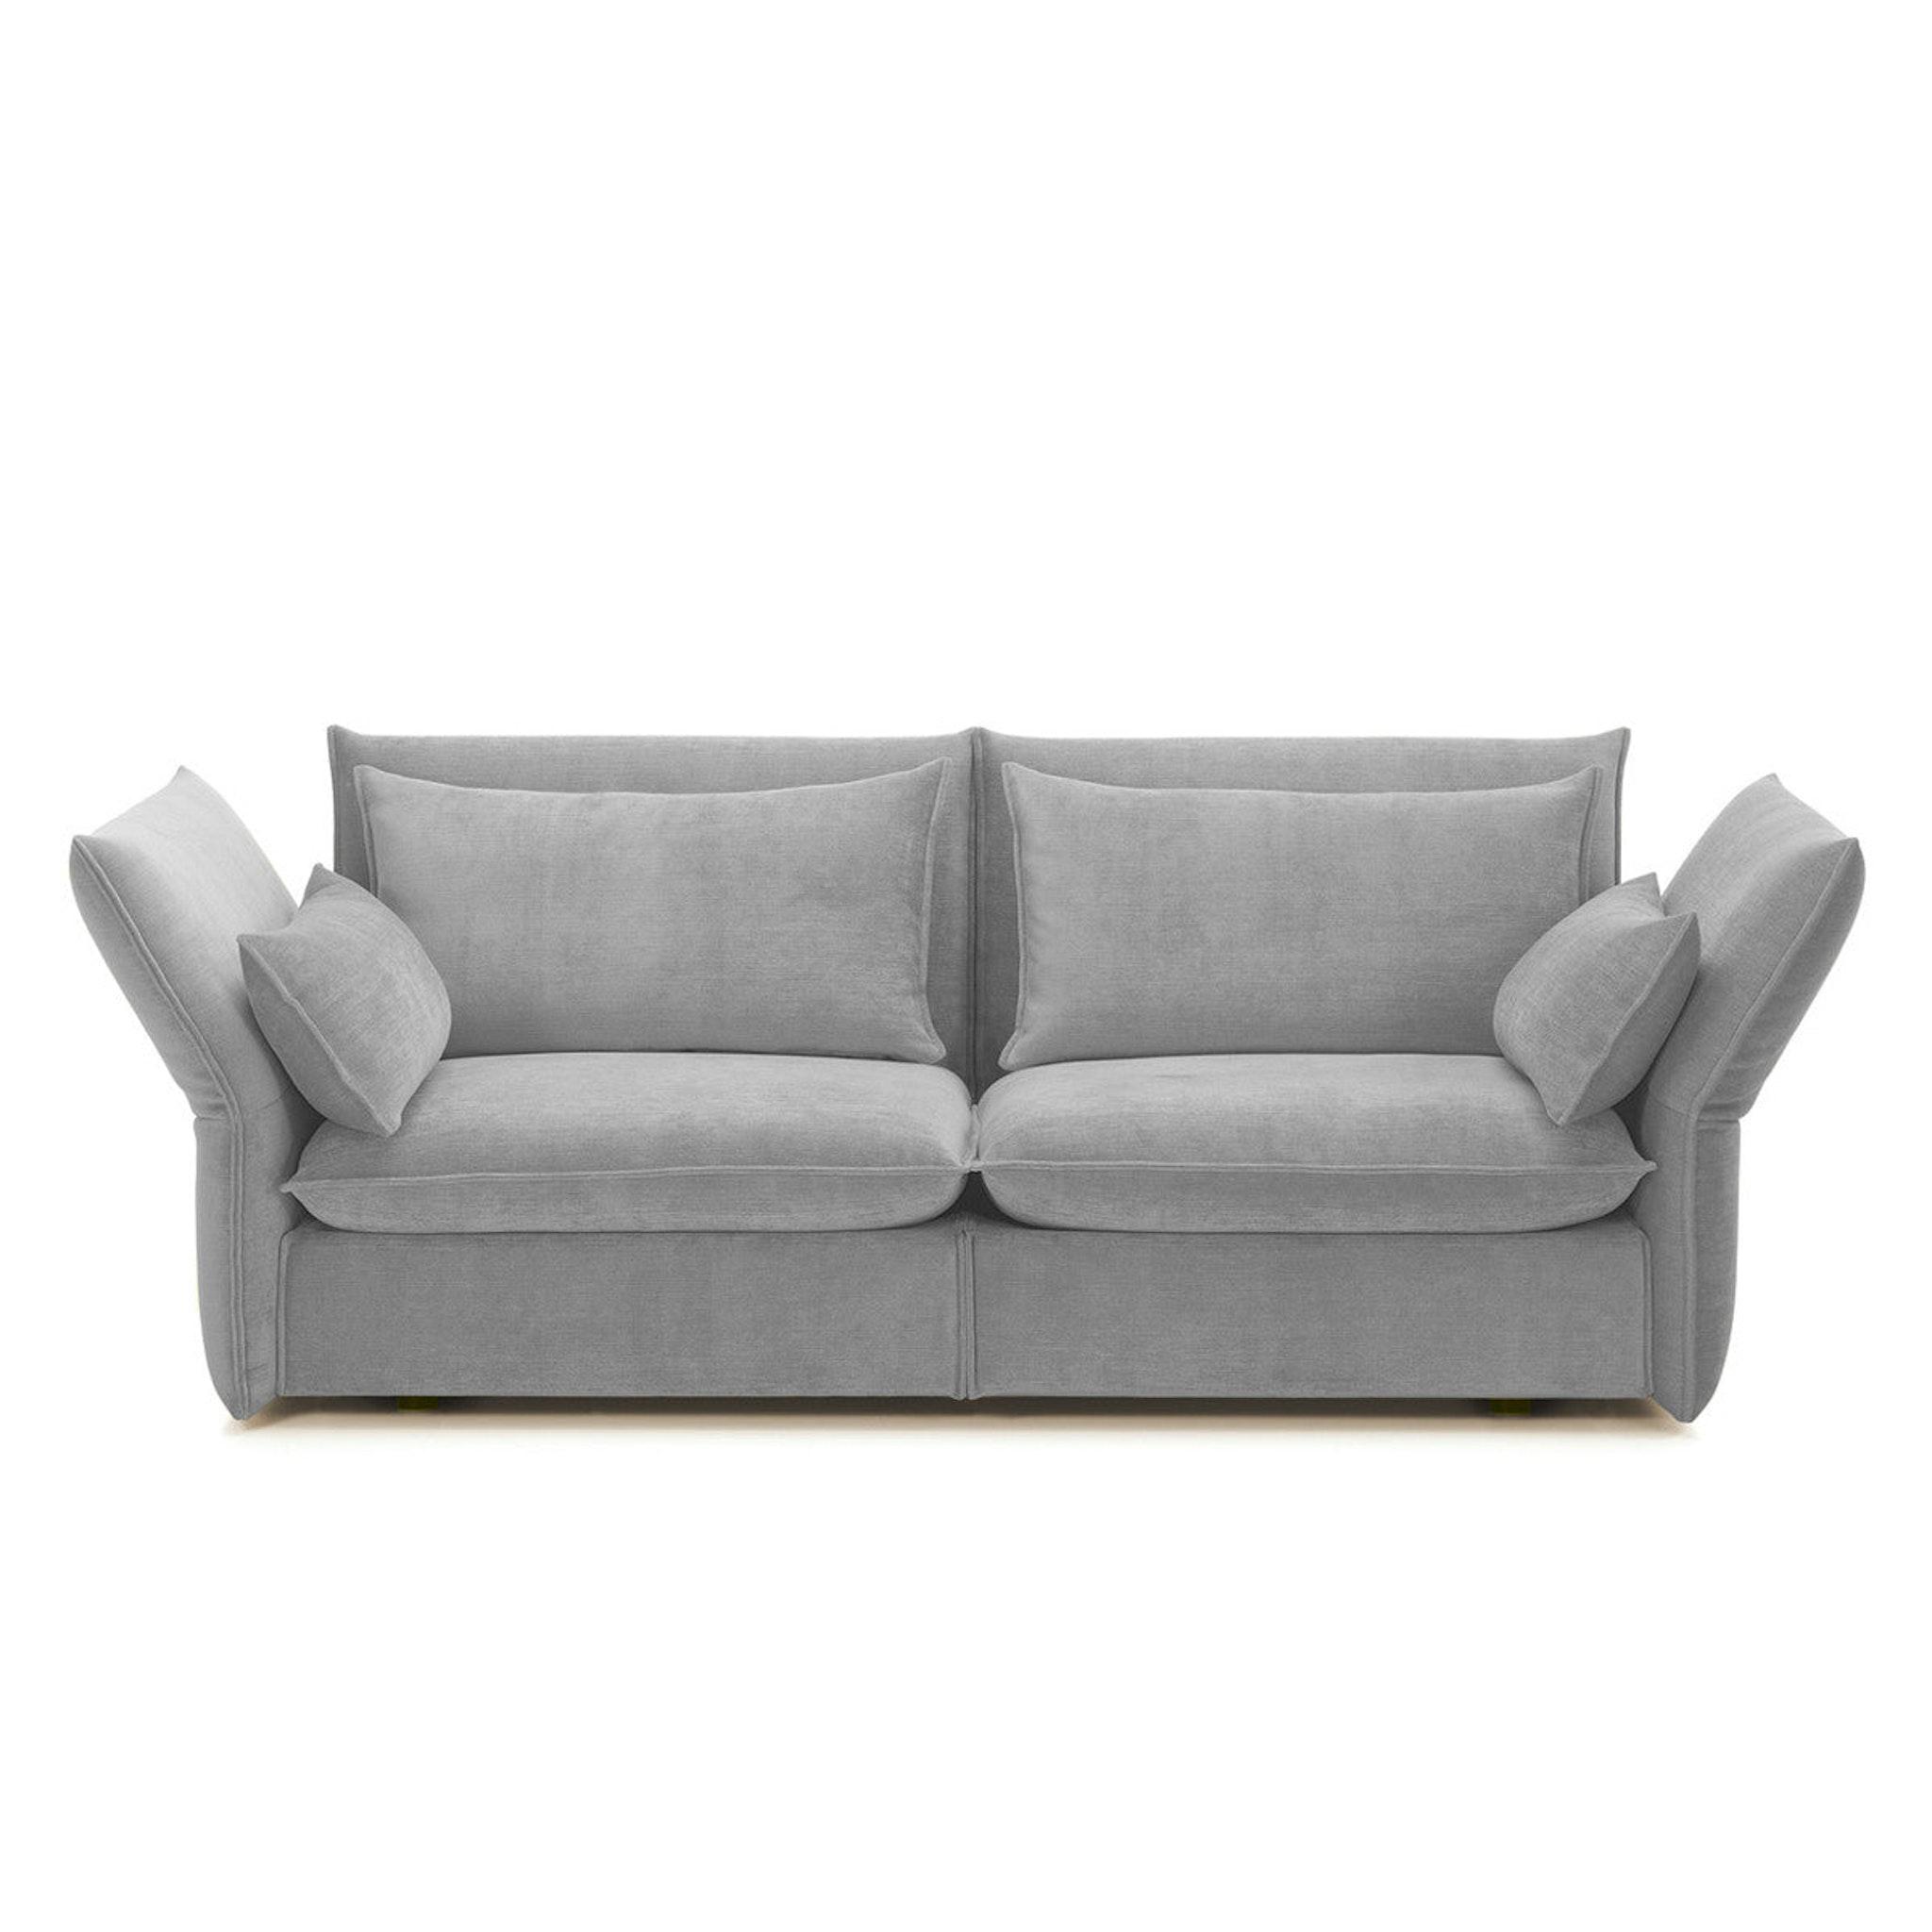 Mariposa Sofa By Vitra Haus